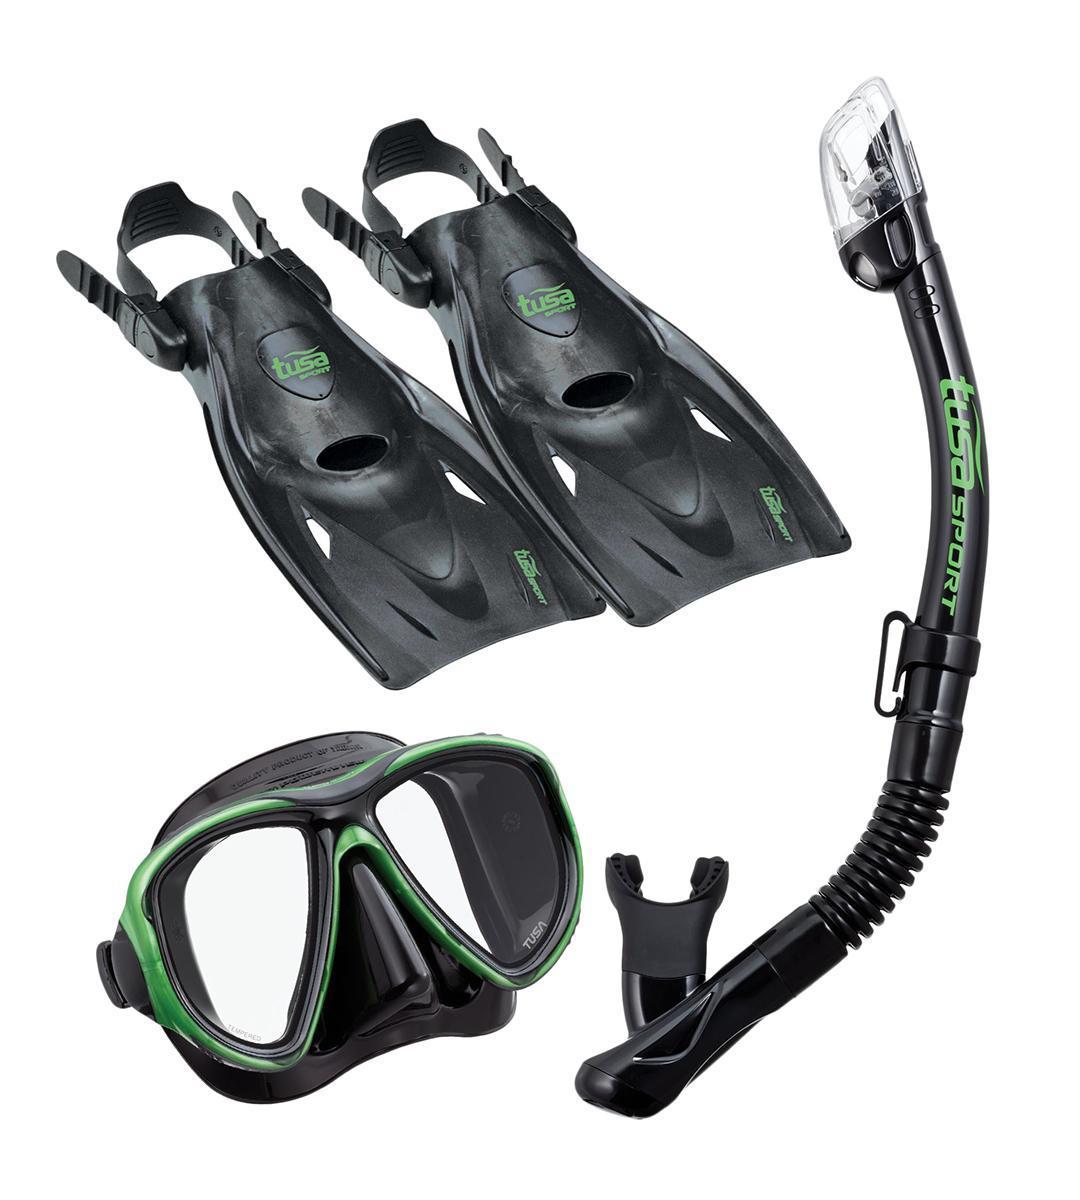 Комплект для плавания Tusa Sport TS UPR2521B BK/SG, р.L (40 -46) цвет: черный, зеленый, размер 40-46